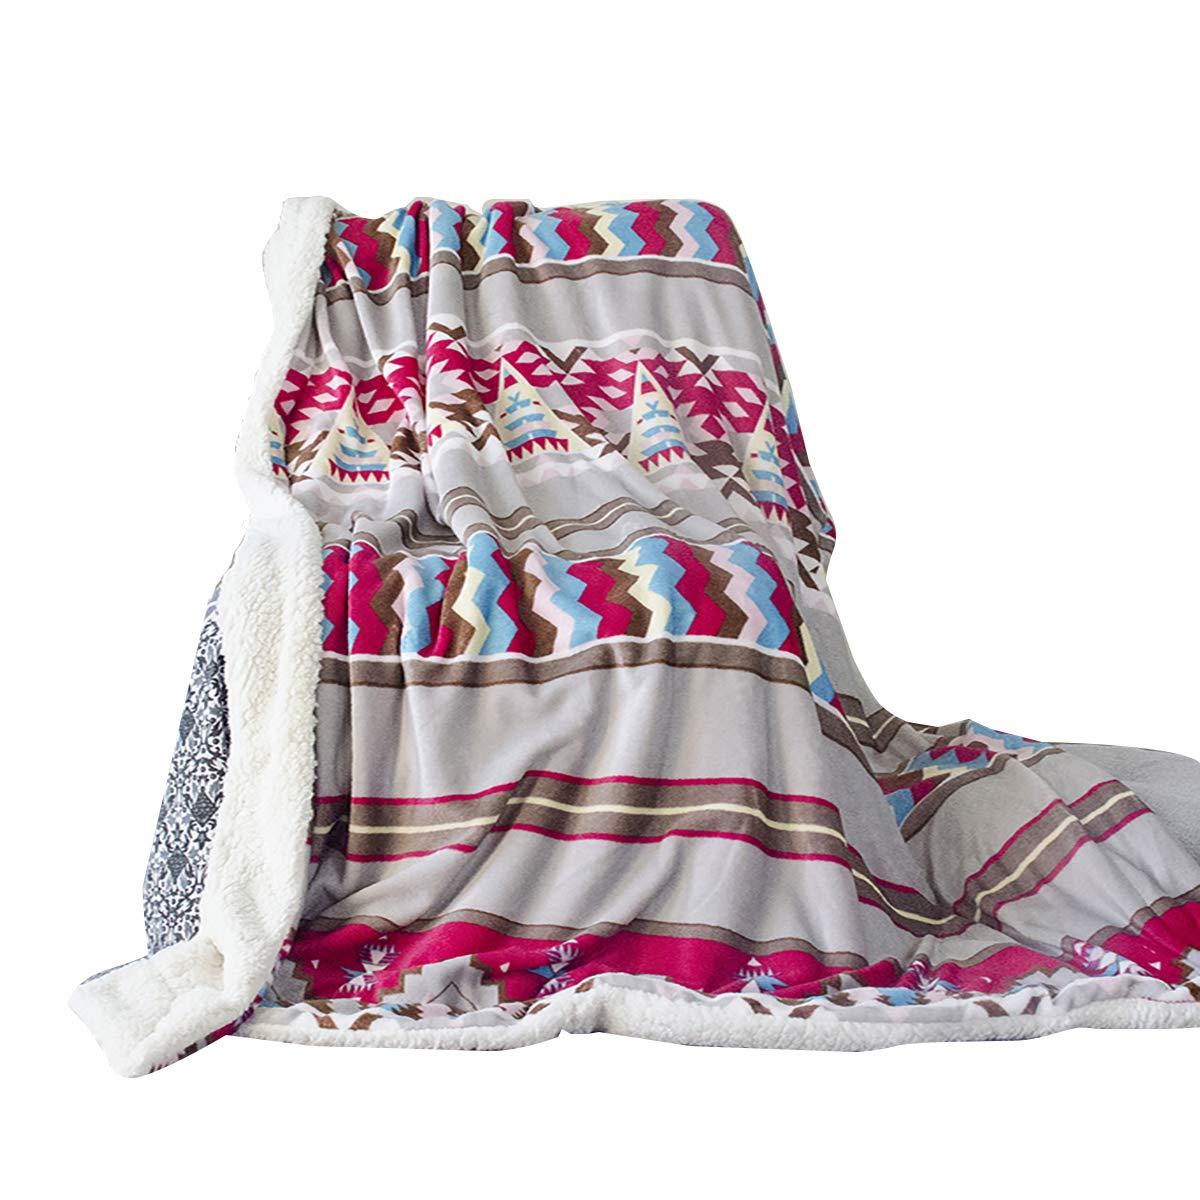 Uozzi Bedding Sherpa Fleece Blanket Warm Soft Luxurious Twin Size Plush TV  Fuzzy Microfiber Colorful Striped Flannel Spring Lightweight Bed Blanket  (60x80) 734fe947e